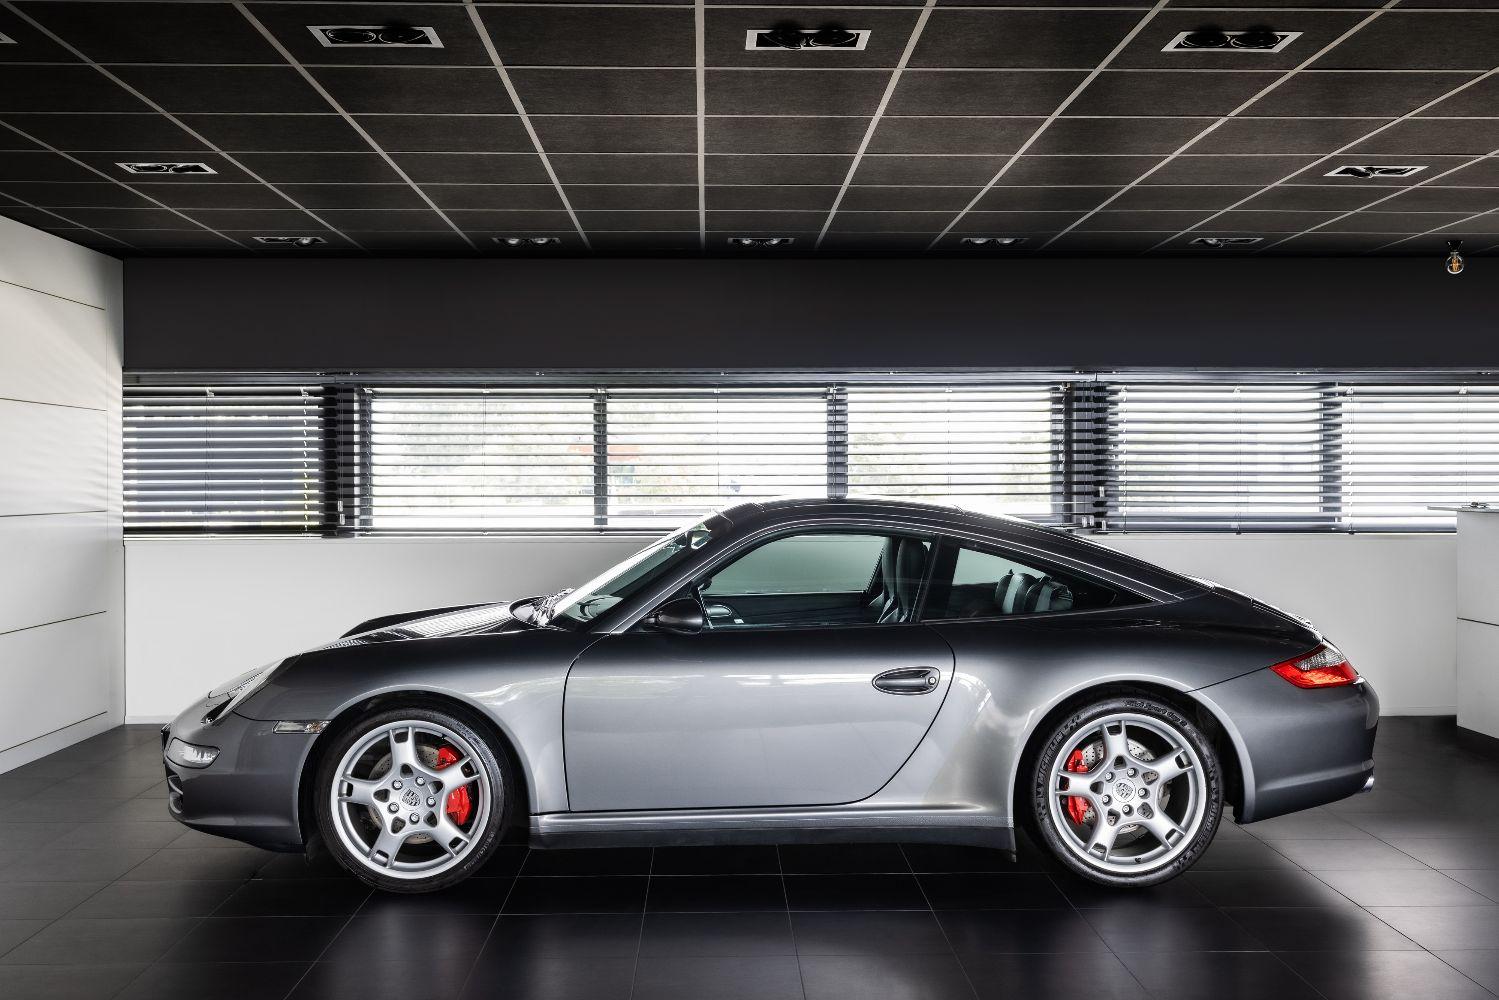 Porsche 997 4s Targa tiptronic